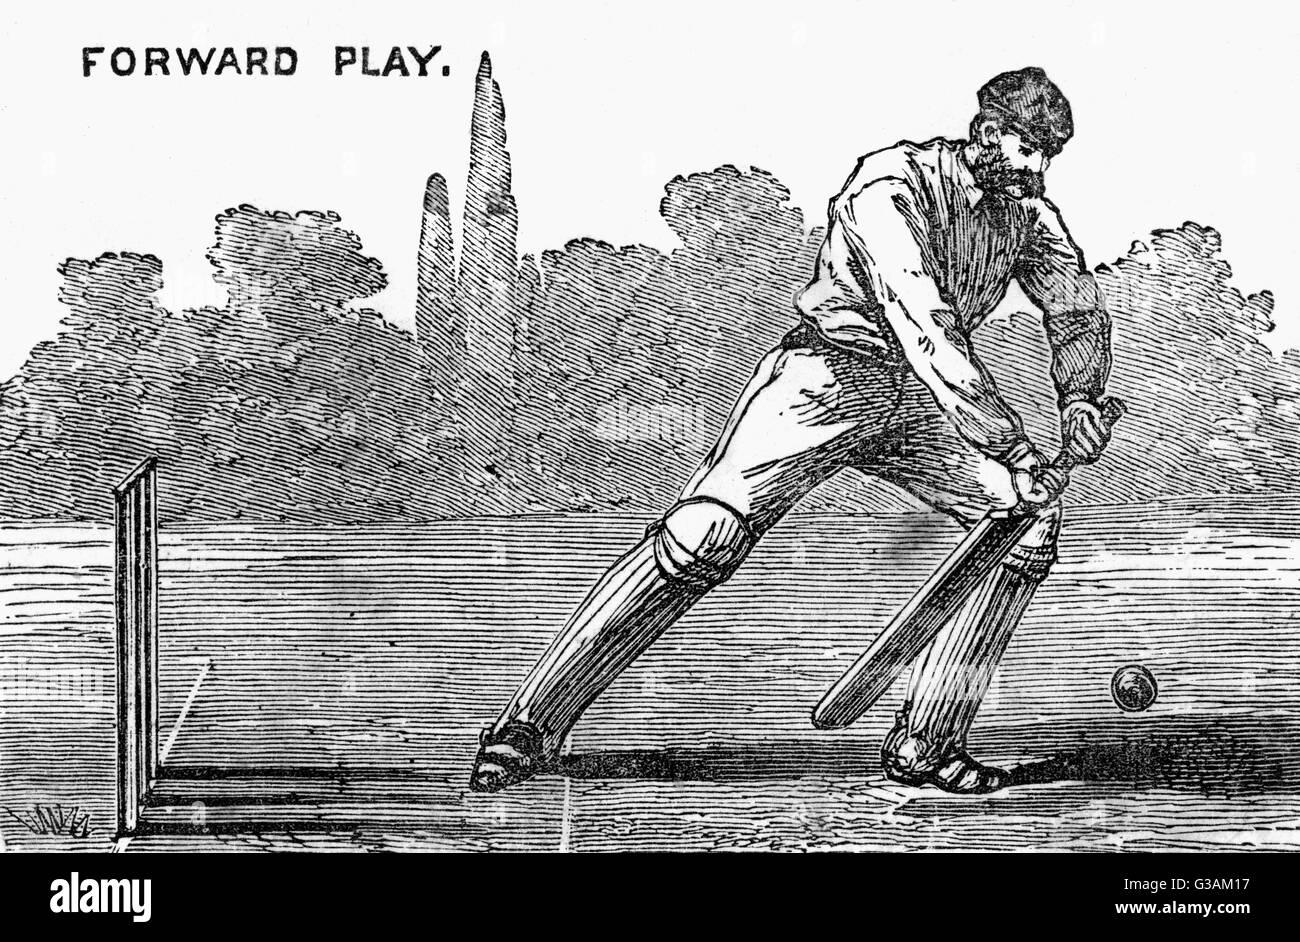 Batsman showing the forward played shot.     Date: 1892 - Stock Image